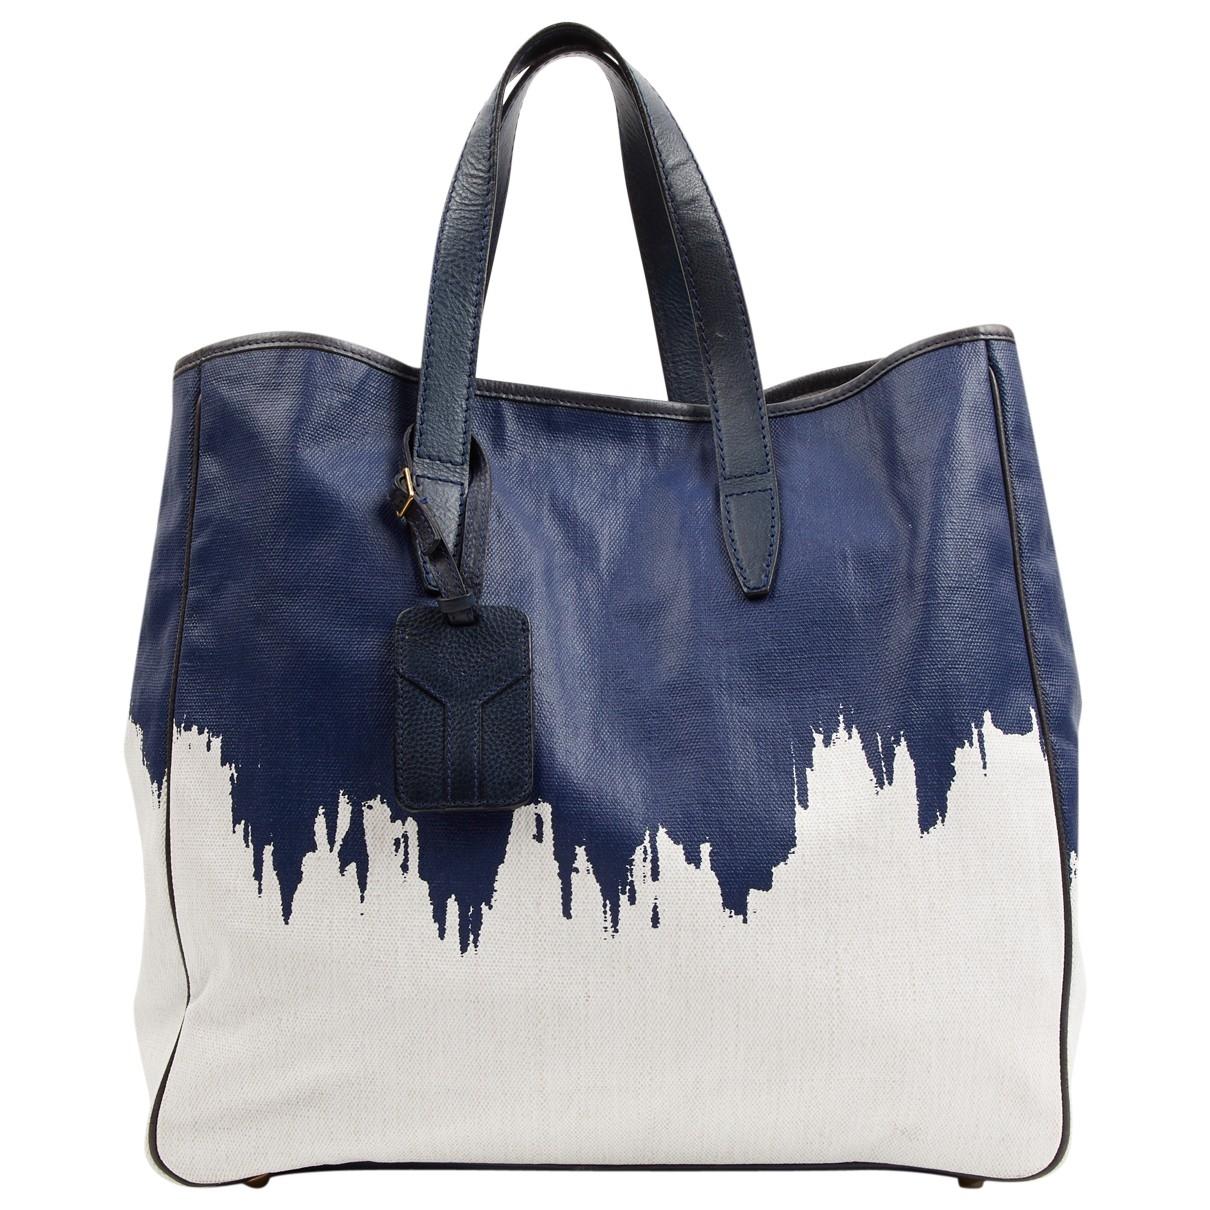 Yves Saint Laurent \N Multicolour Cloth handbag for Women \N